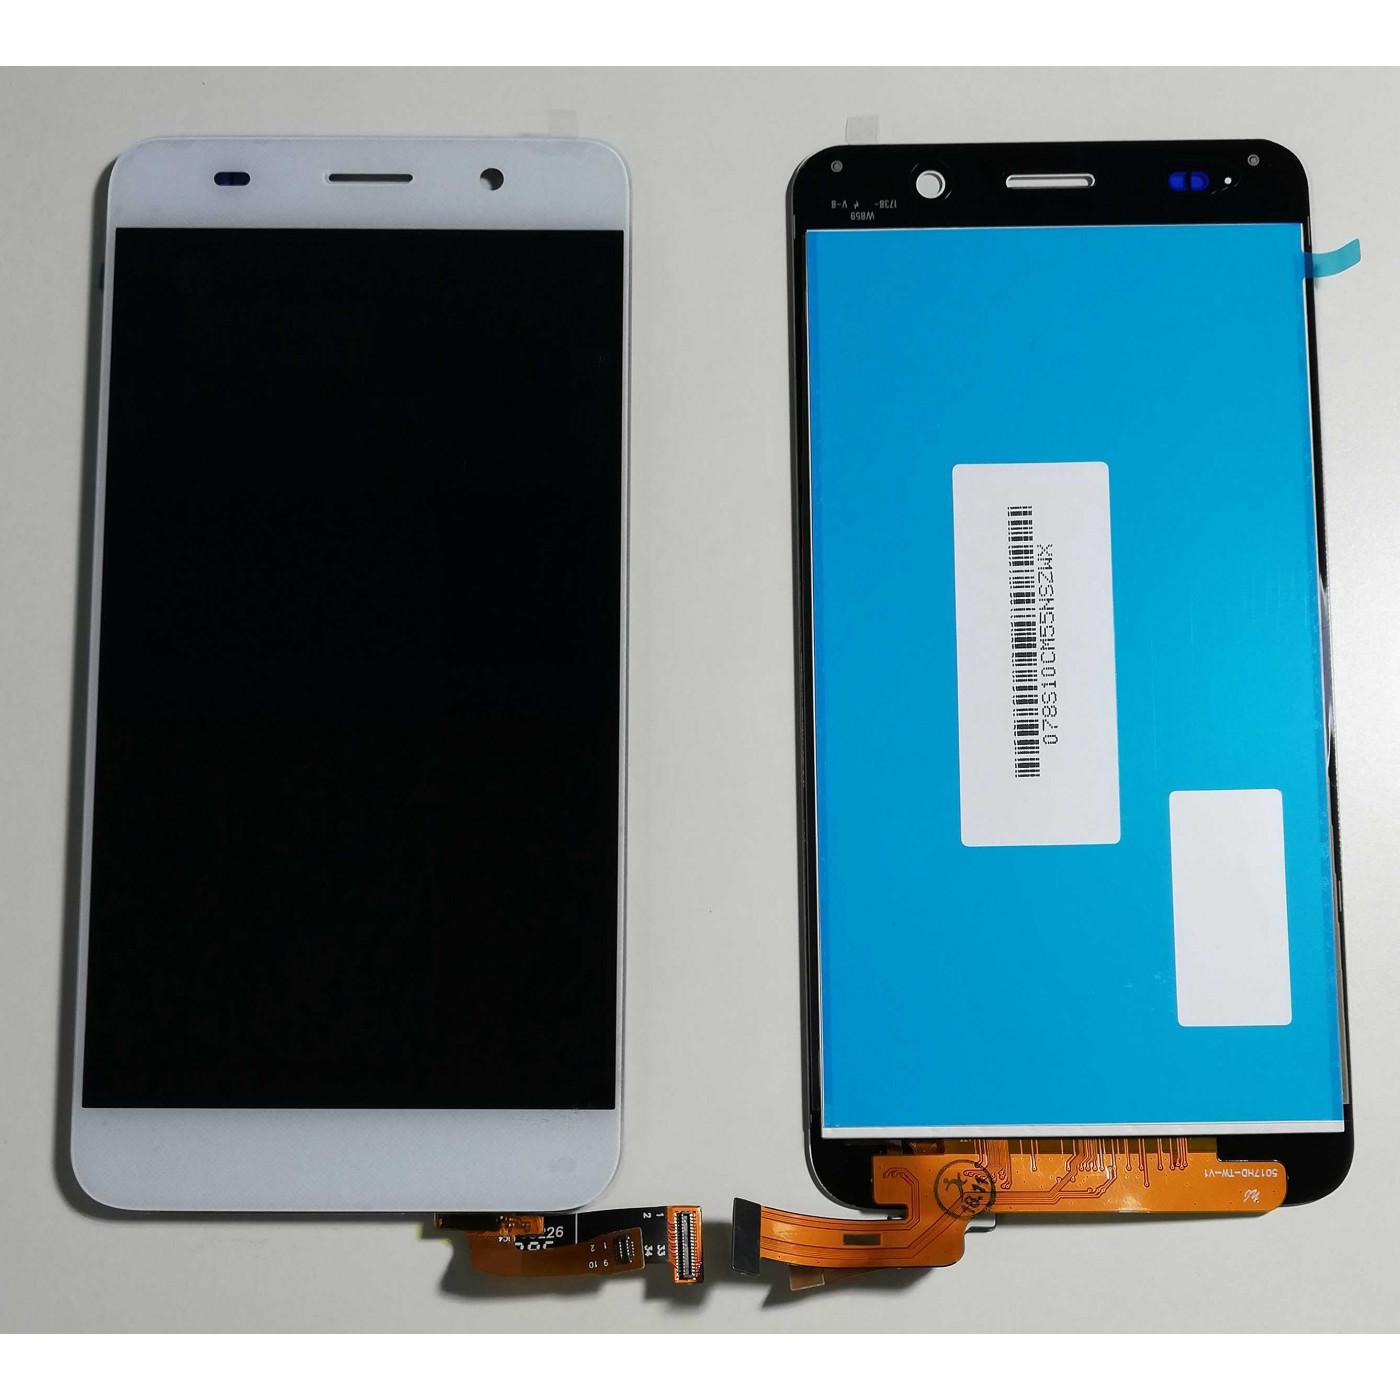 PANTALLA TÁCTIL PANTALLA LCD DE VIDRIO + ASSEMBLED blanca Huawei Ascend SCL-L01